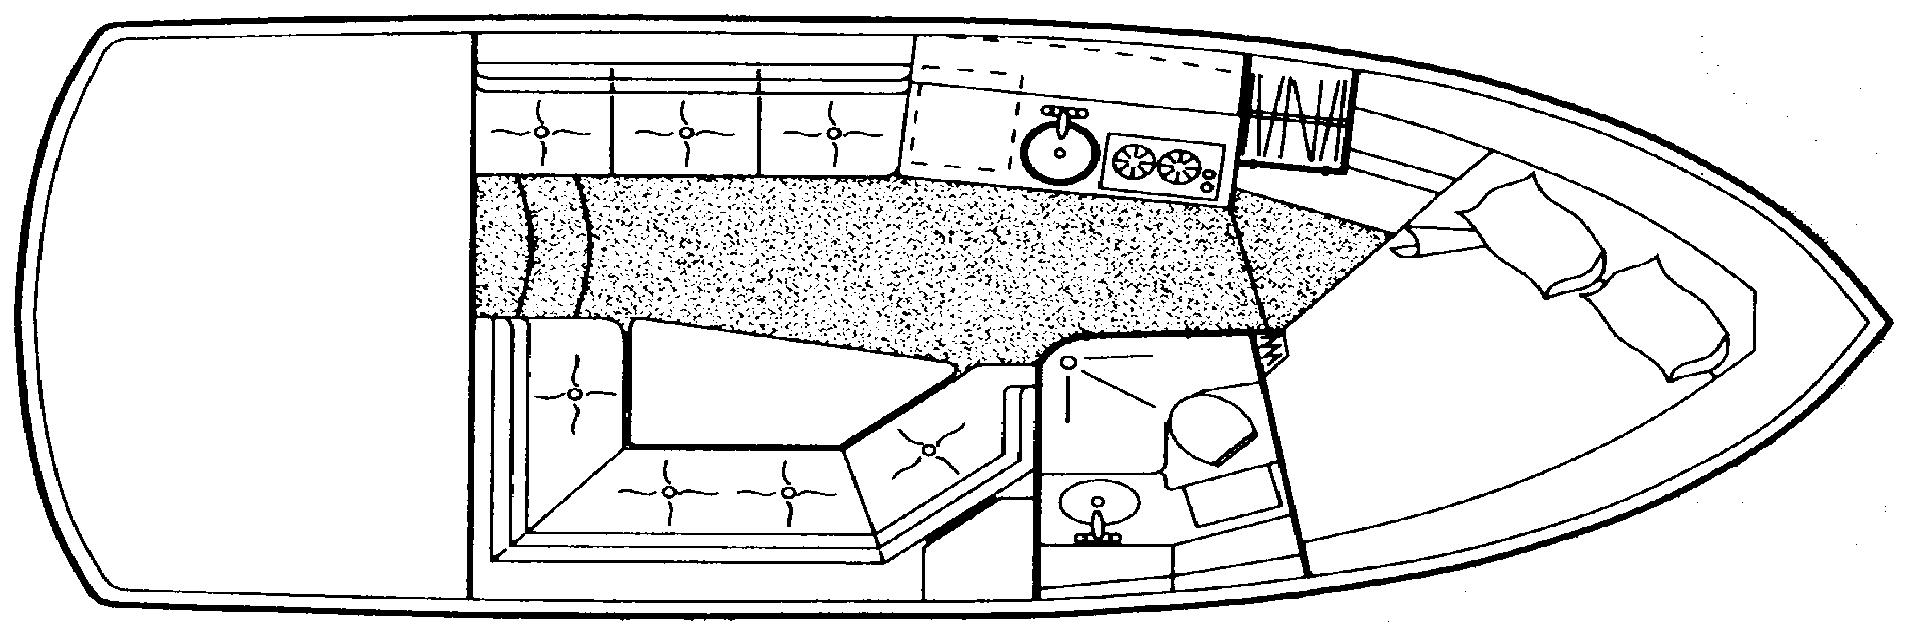 310 Santego Floor Plan 1